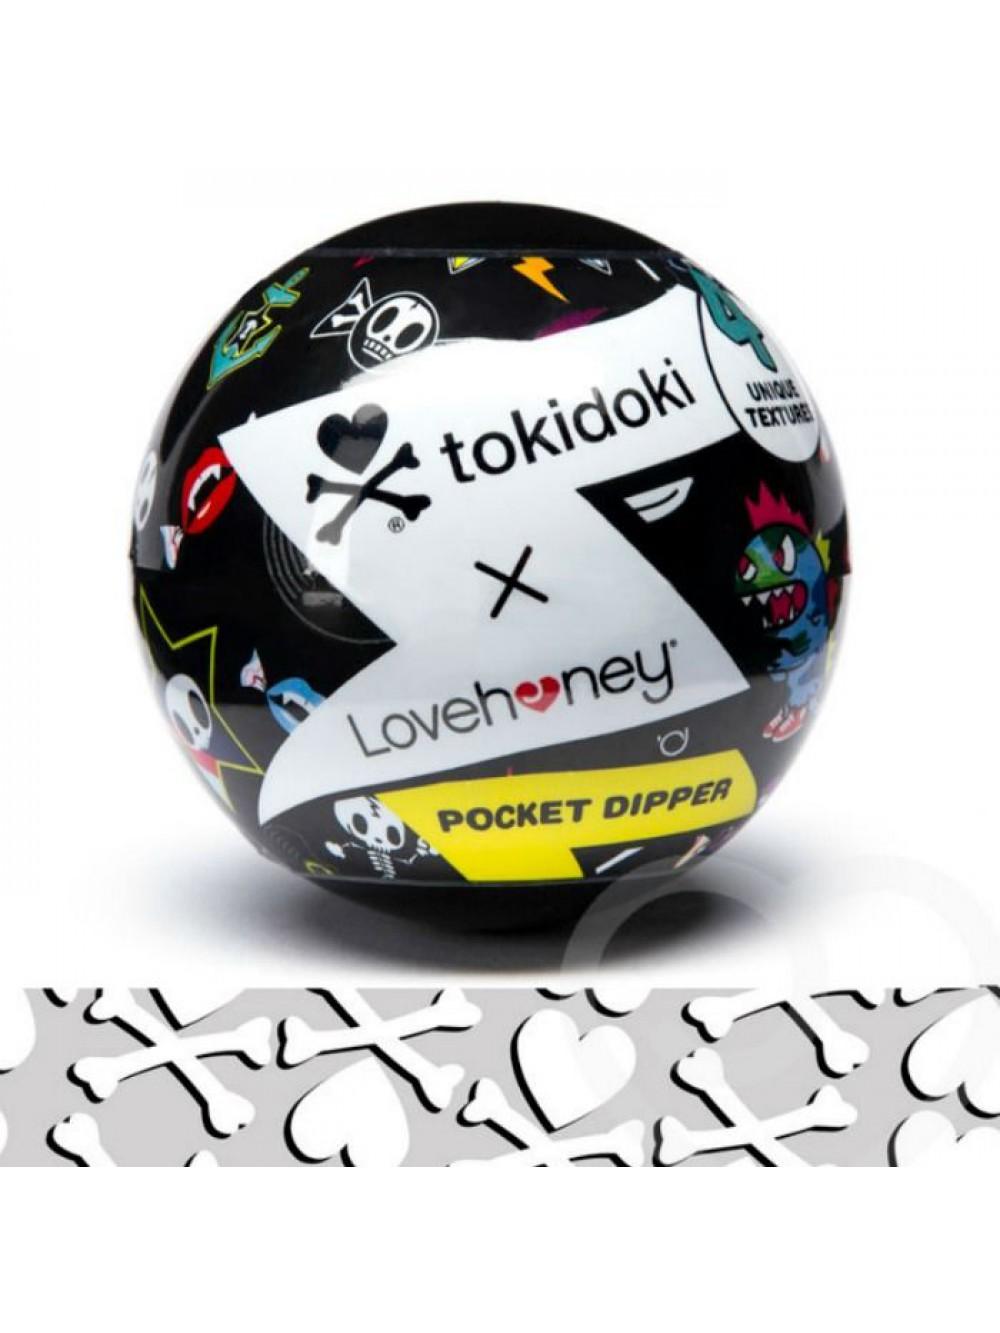 TOKIDOKI TEXTURED PLEASURE CUP CROSSBONES 5060481965033